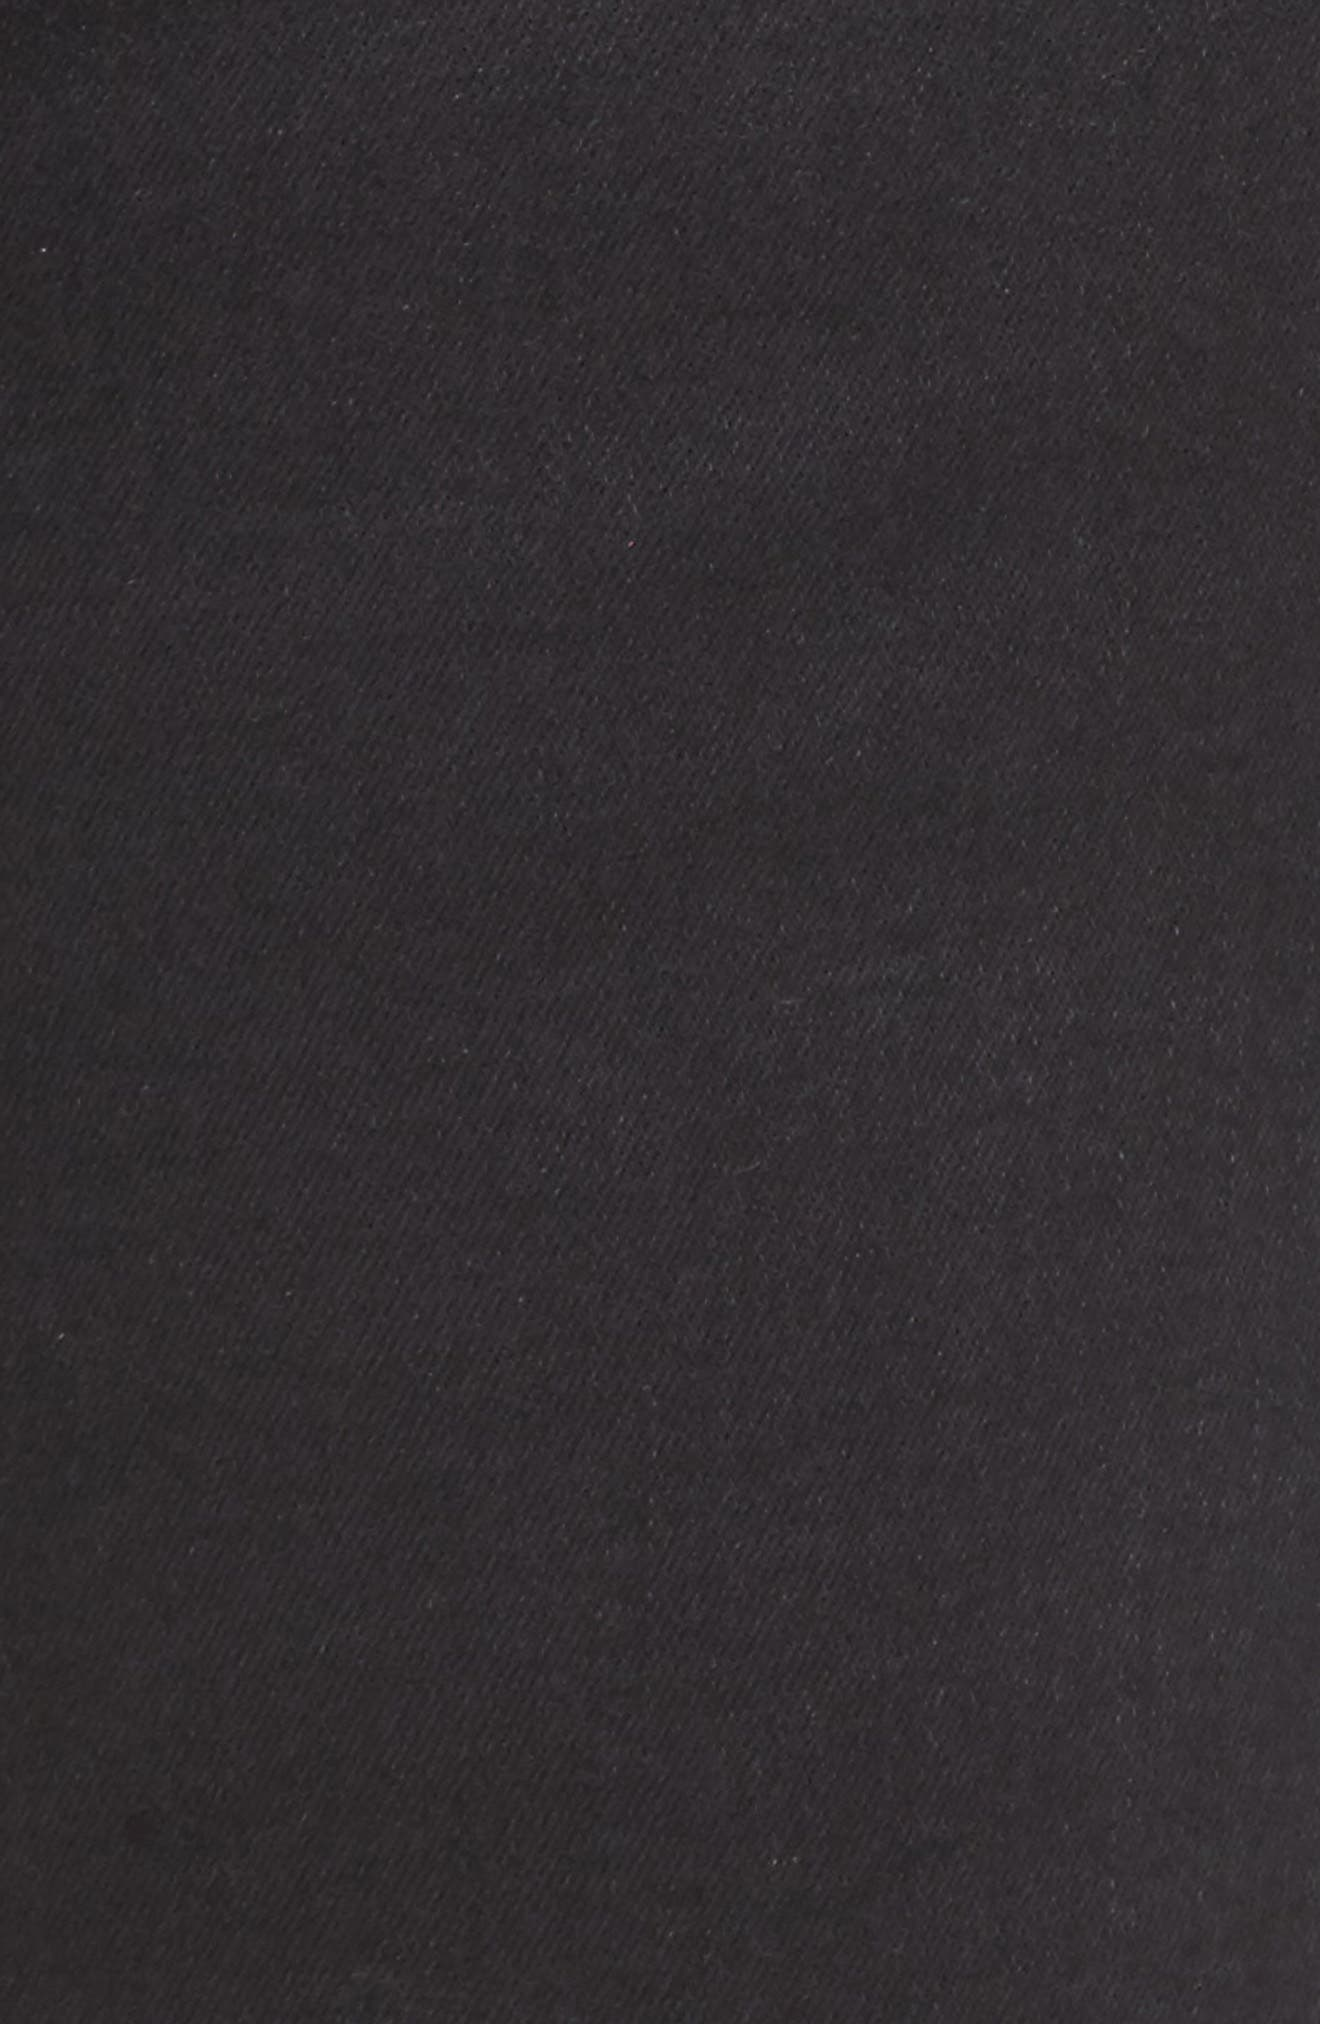 SEVEN7,                             Distressed Slant Raw Hem Skinny Jeans,                             Alternate thumbnail 5, color,                             001